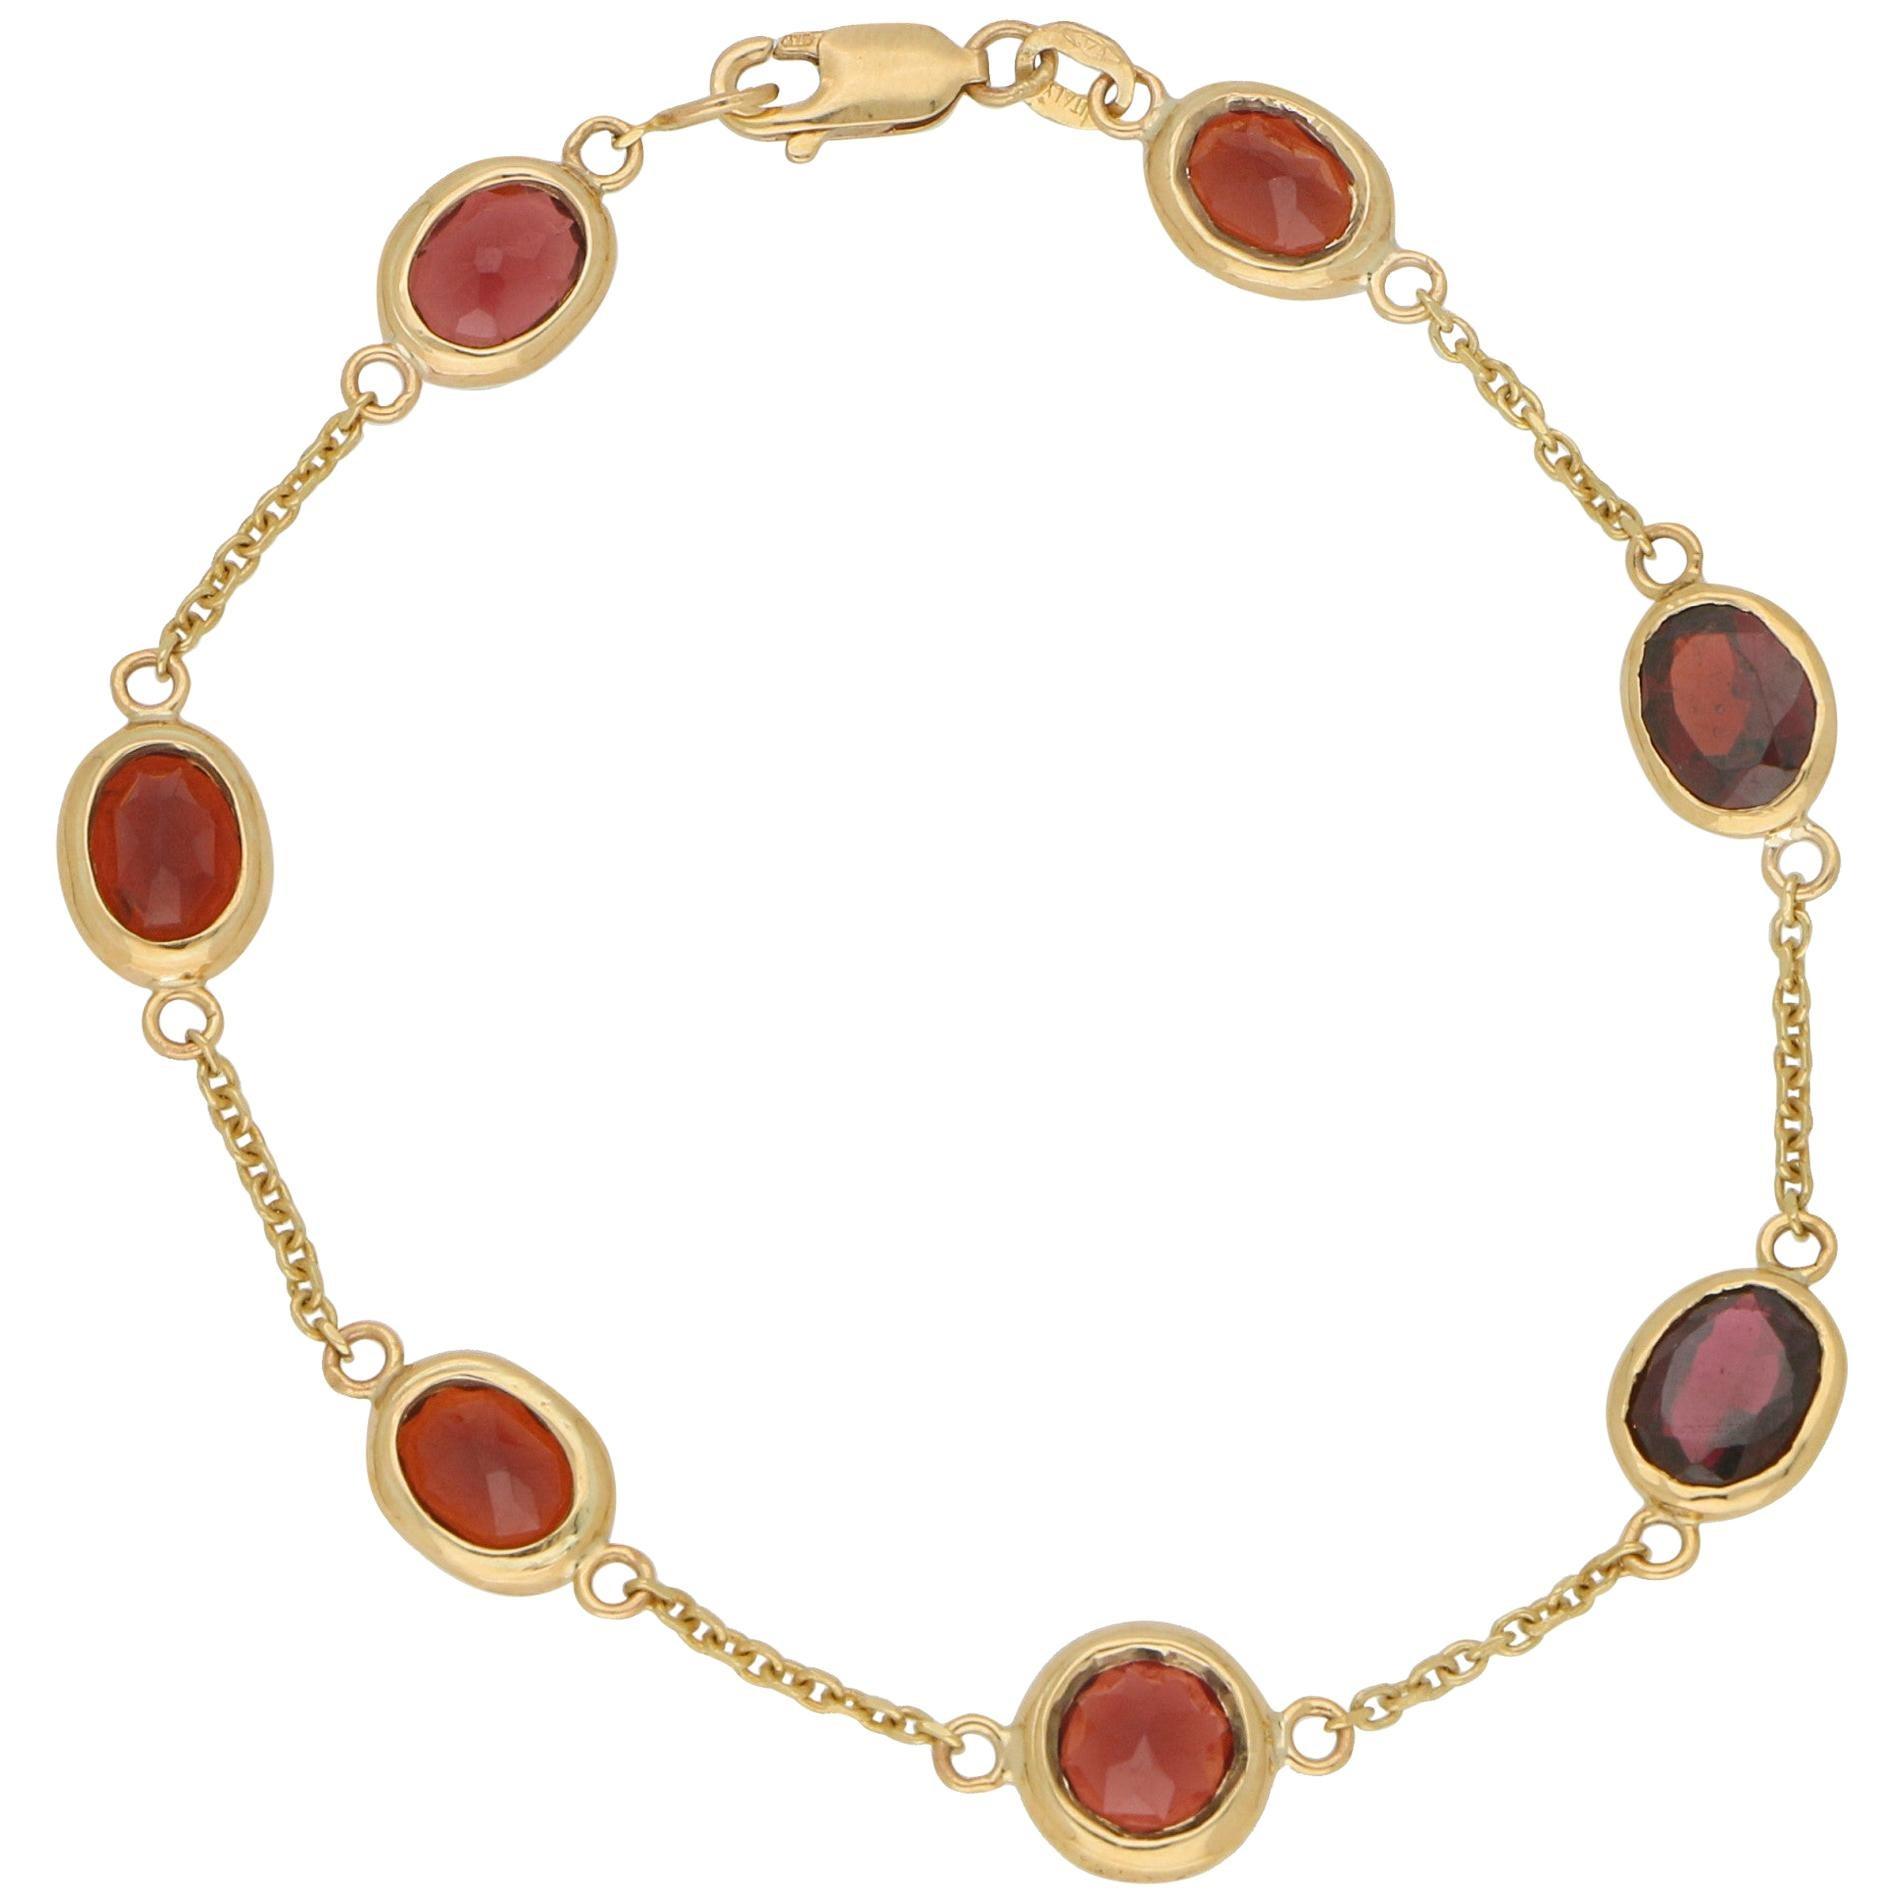 Red Garnet Spectacle Chain Bracelet Set in 9 Karat Yellow Gold